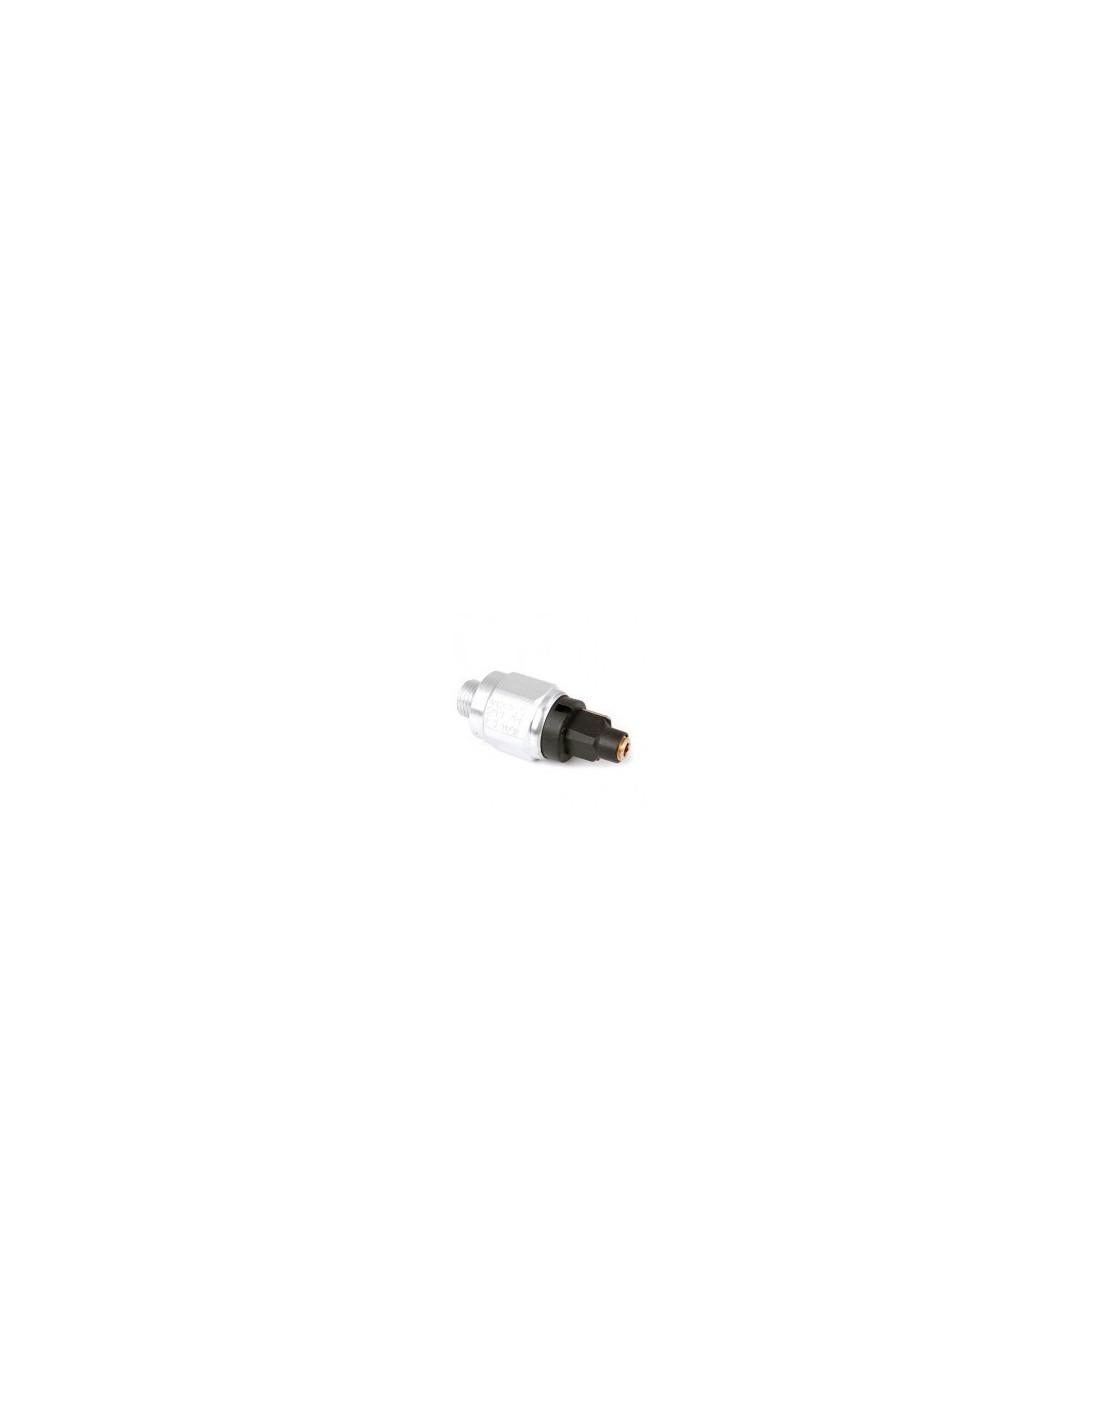 OST01851 - Tryckgivare BHV 412,010.1 1-10 bar